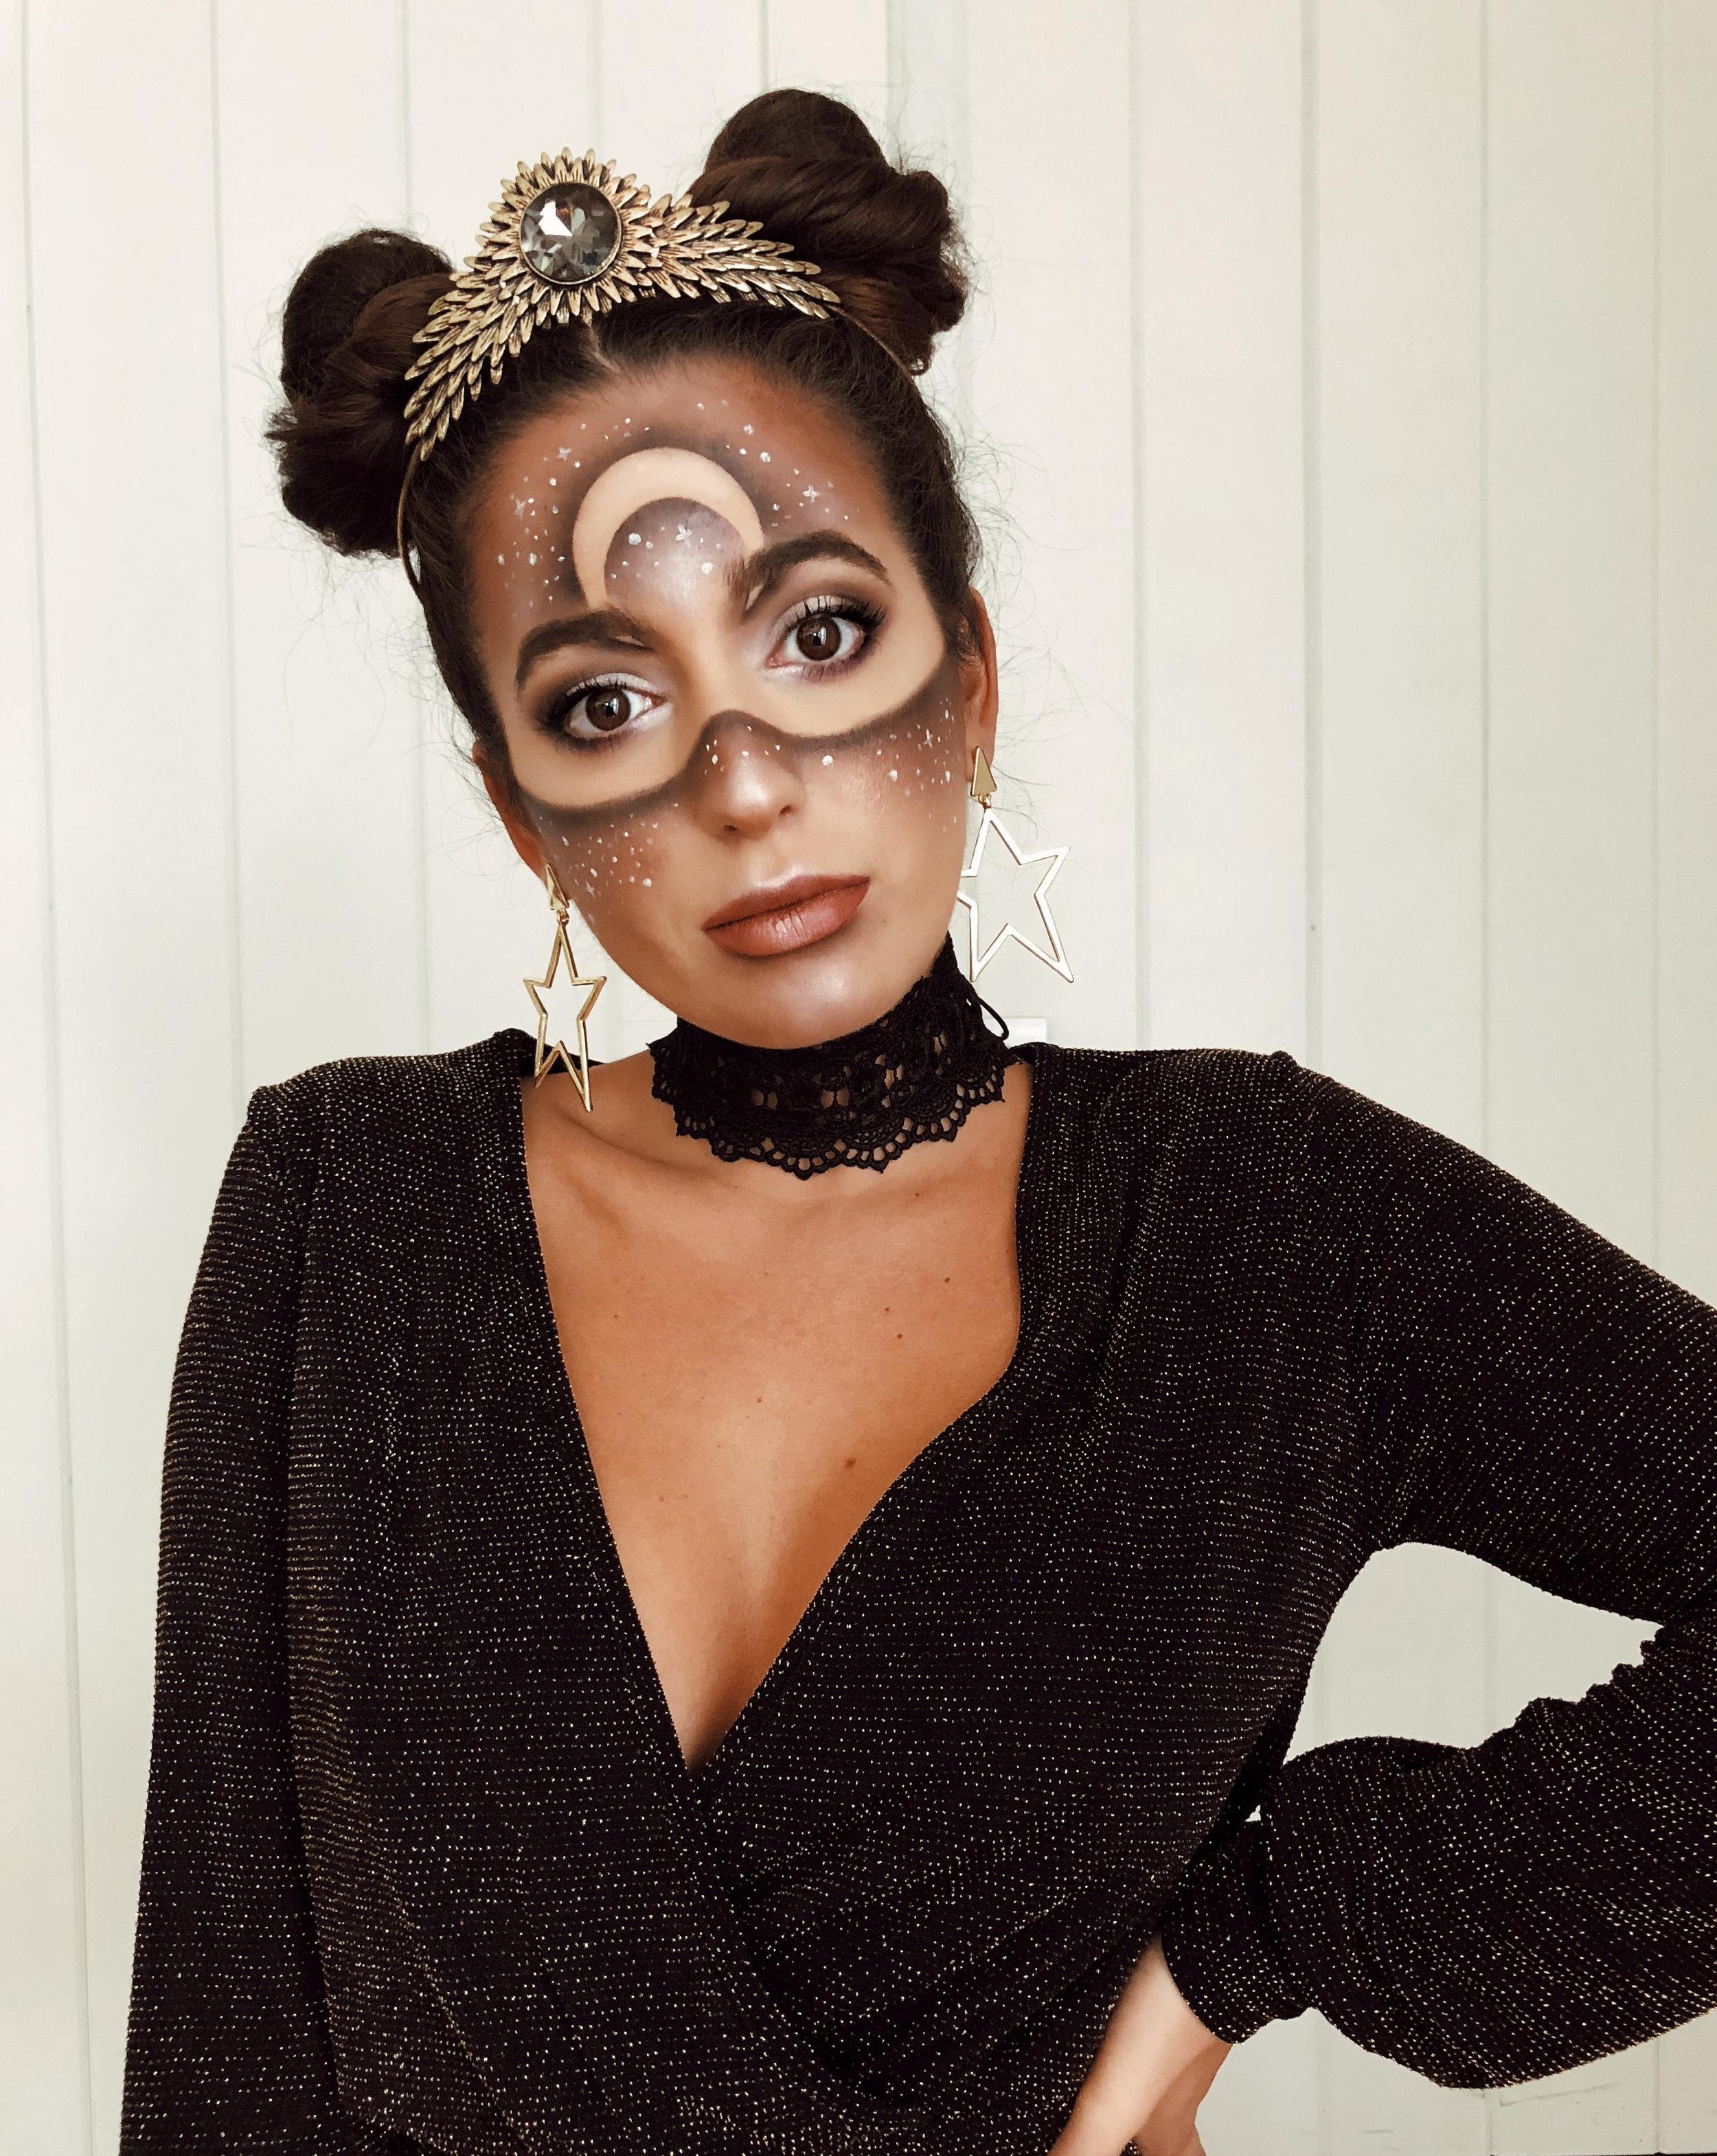 galaxy-alien-moon-stars-crown-space-buns-bodypaint-halloween-makeup-mua